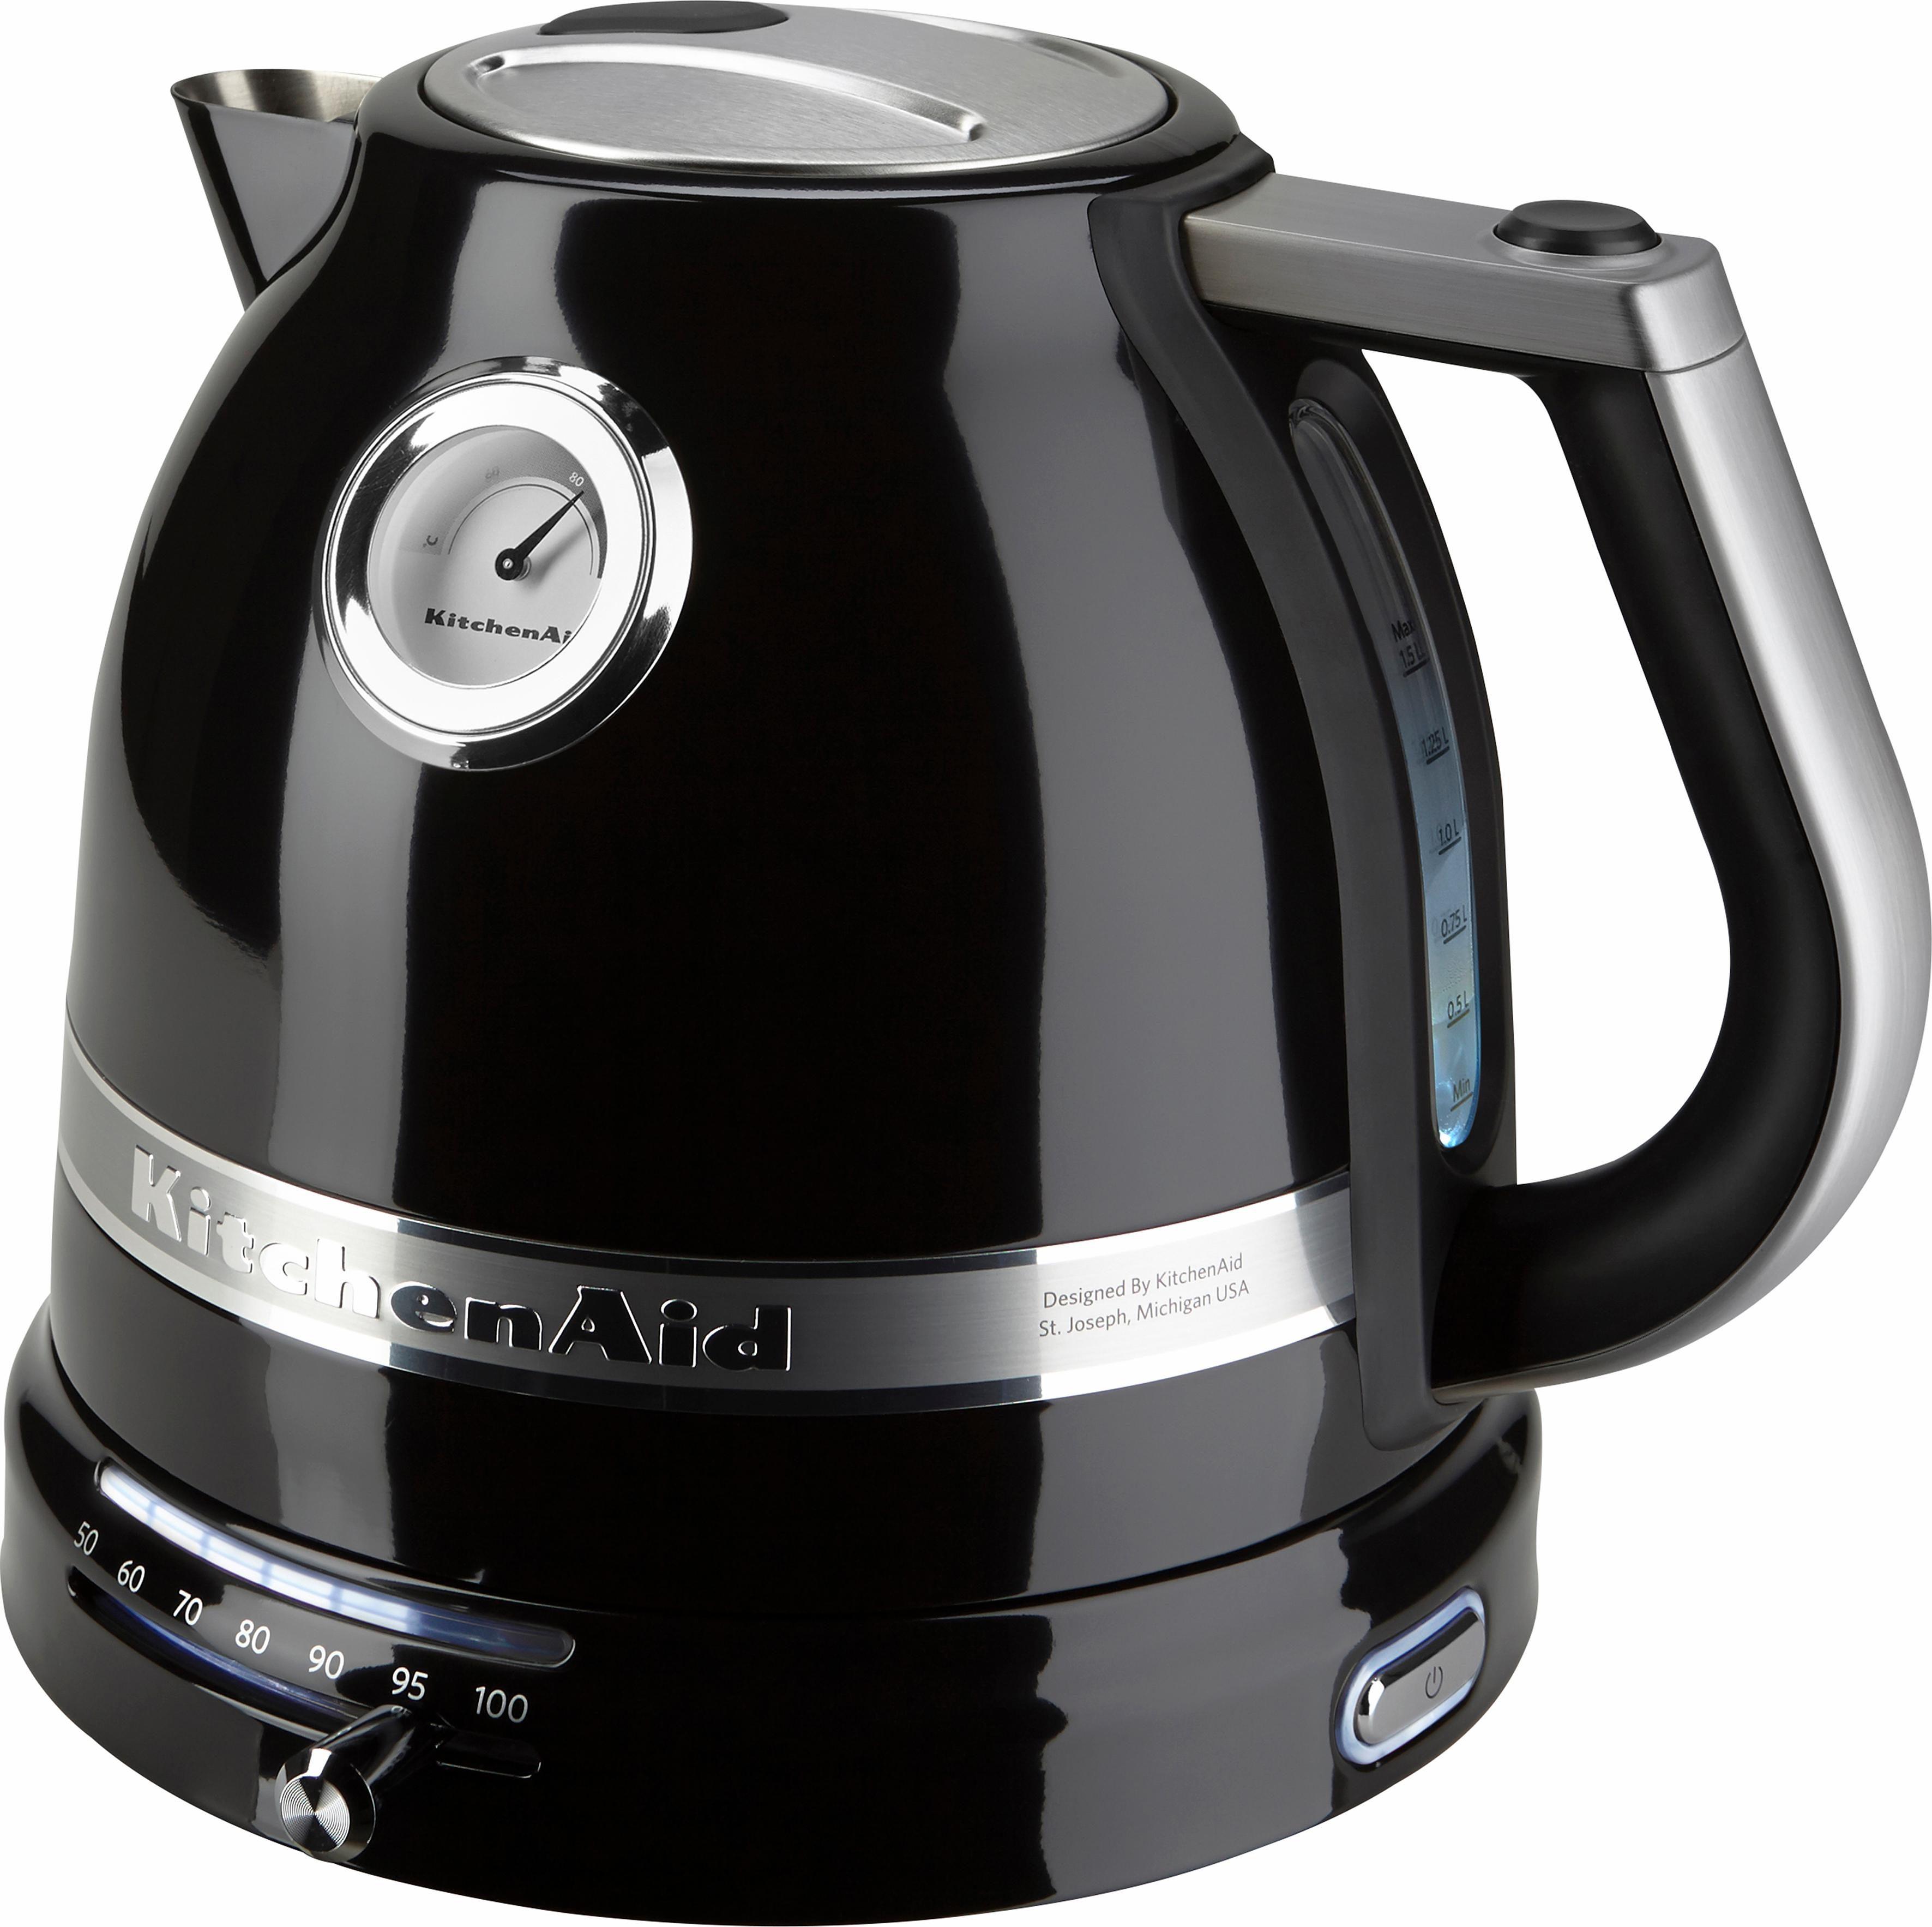 KitchenAid Wasserkocher 5KEK1522EOB, 1,5 l, 2400 W, onyx schwarz